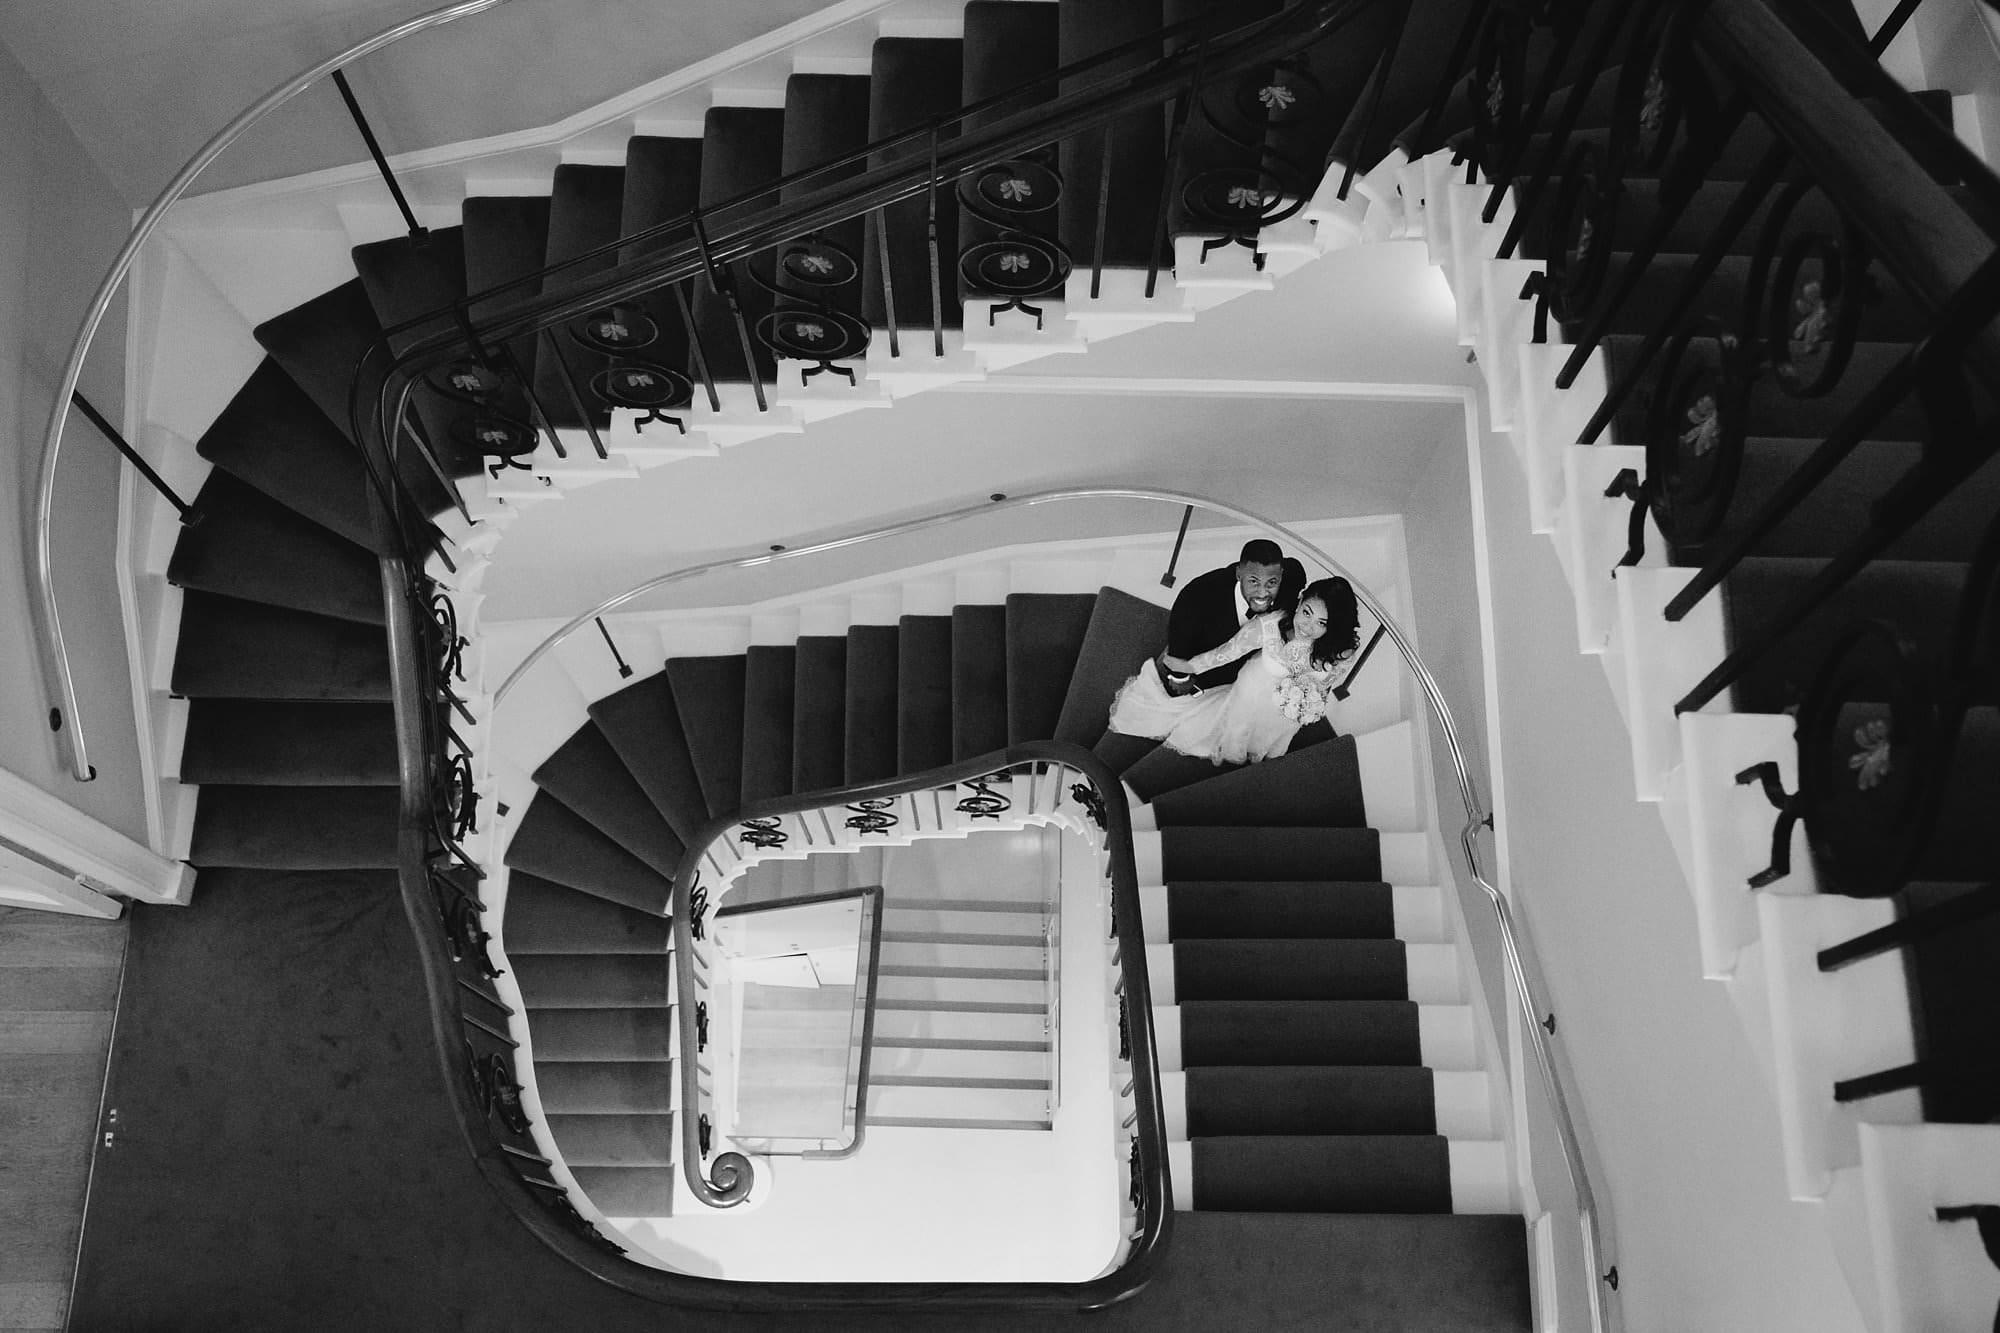 asia house london wedding photographer 033 - Rachel + Gabriel   Asia House Wedding Photography